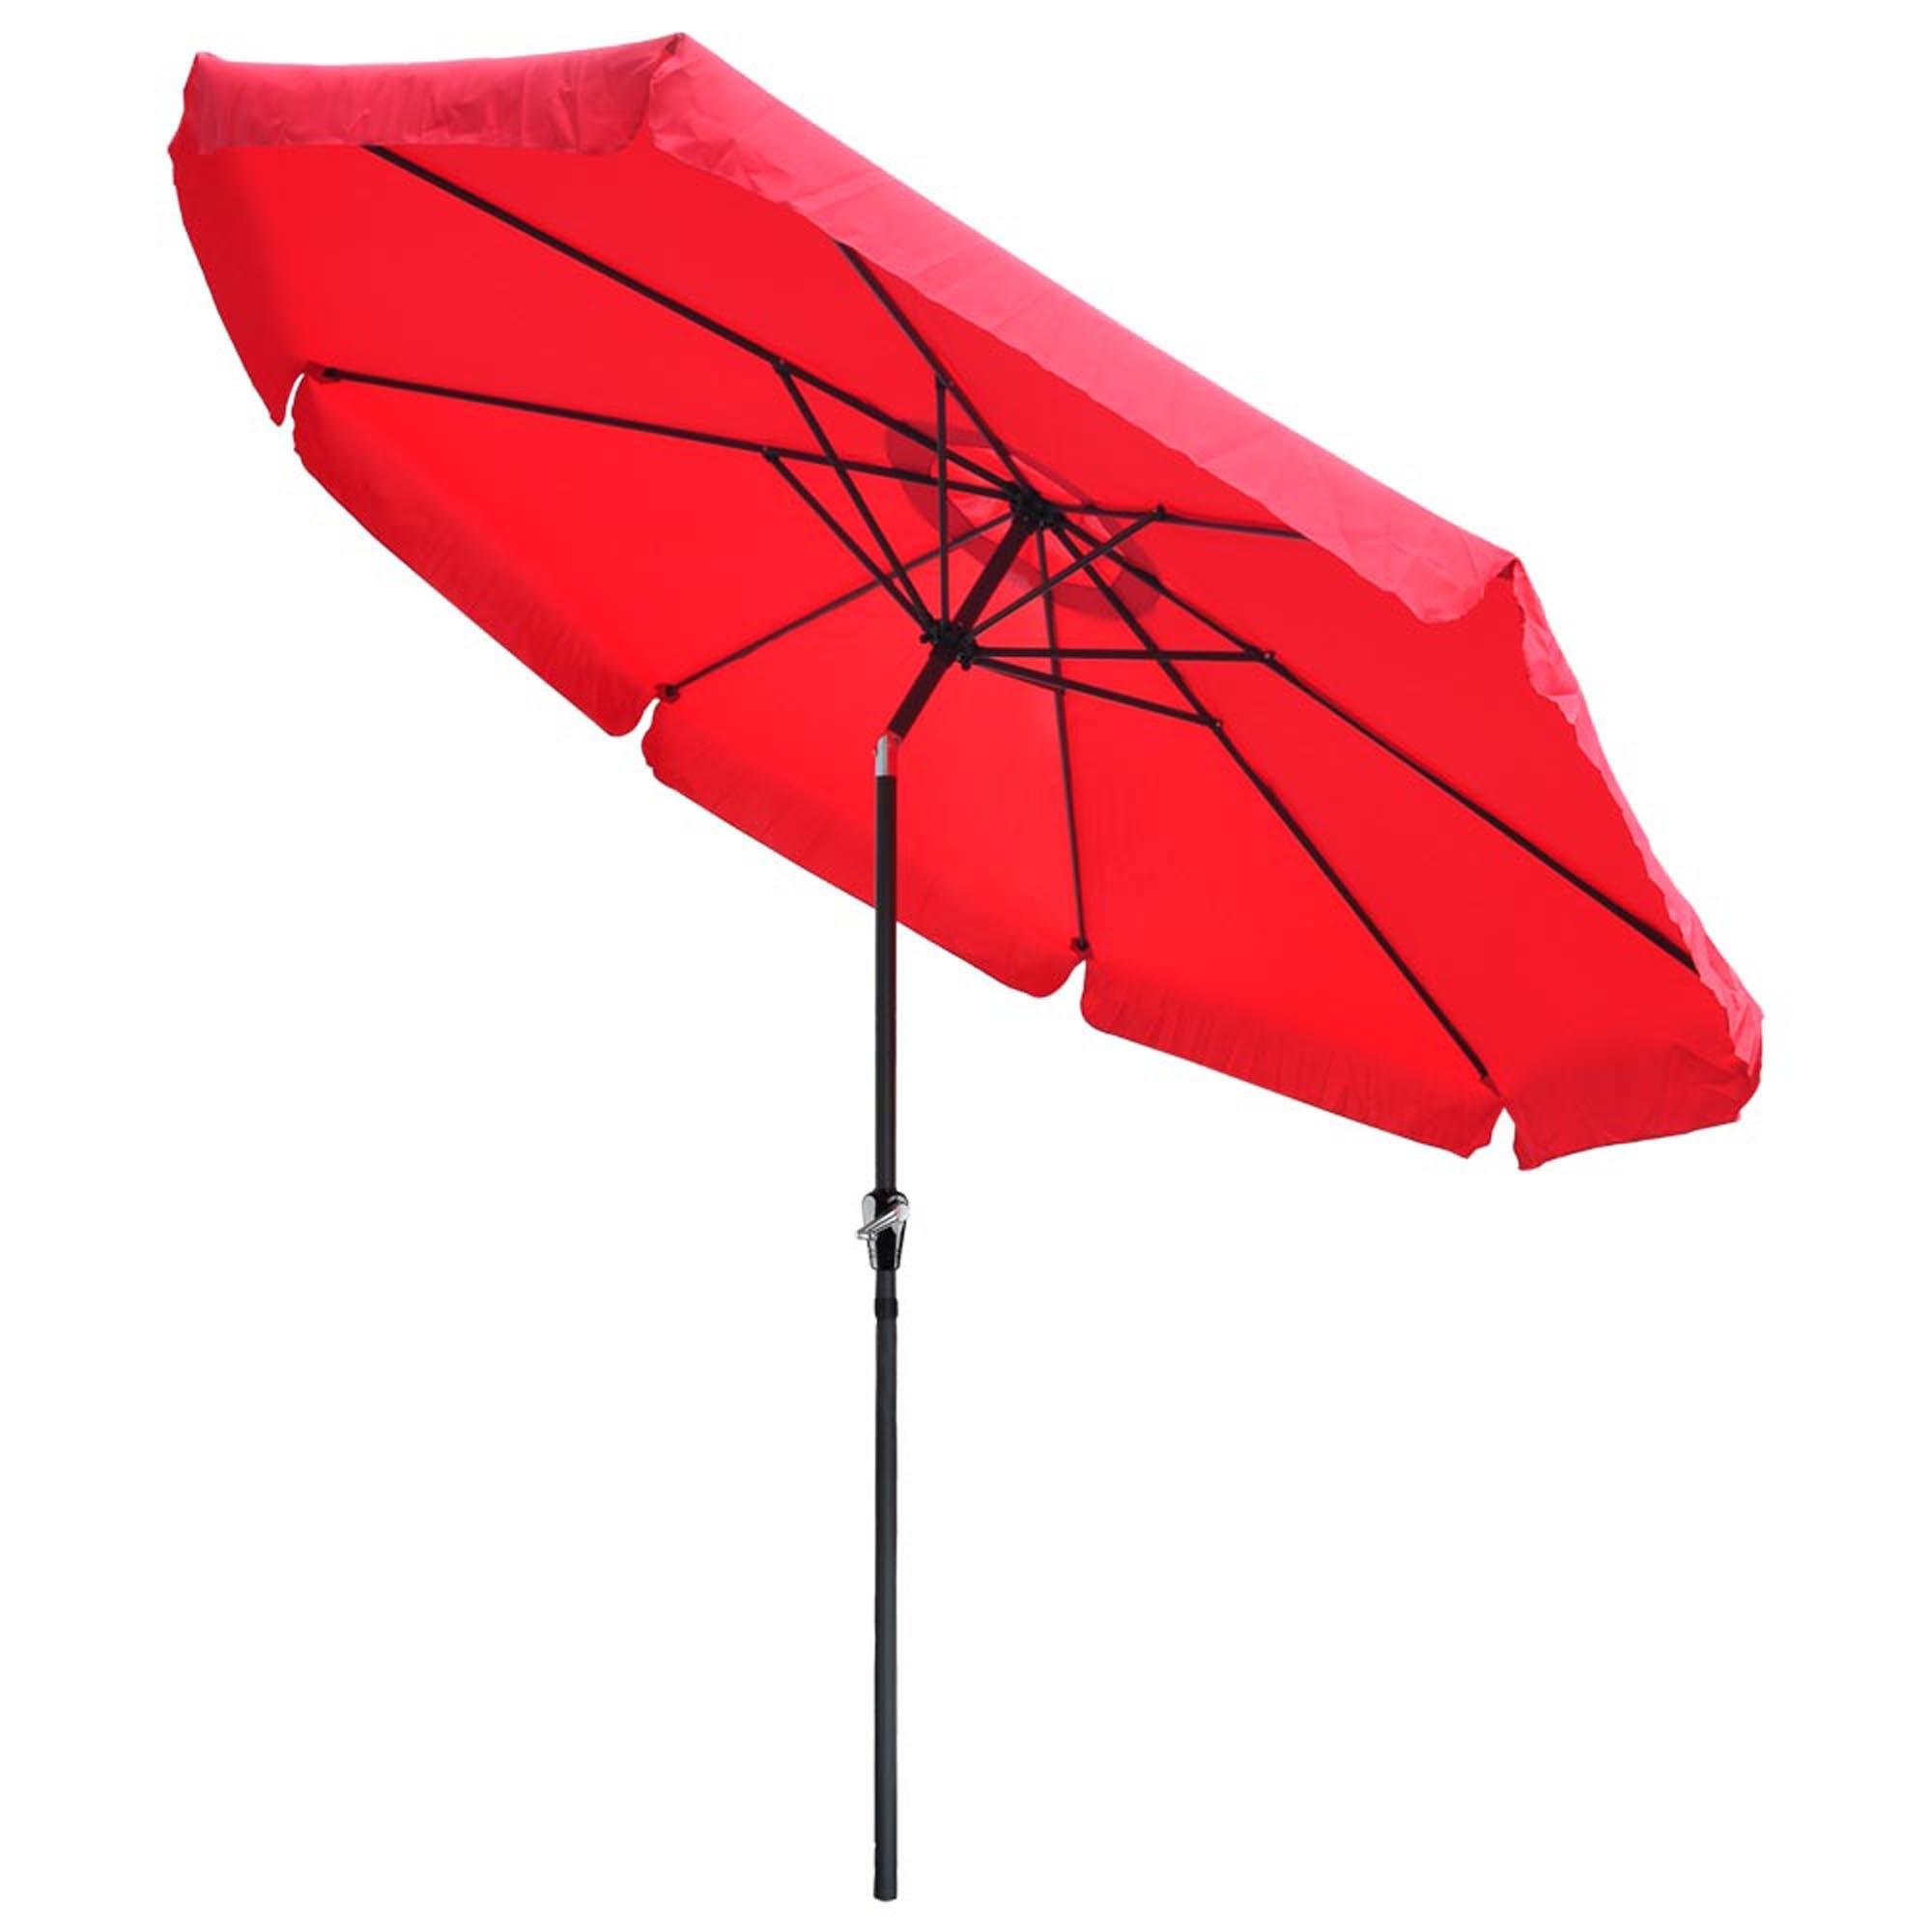 Outdoor Patio Umbrella Base Stand w//Valance Crank Tilt Sunshade Market Garden